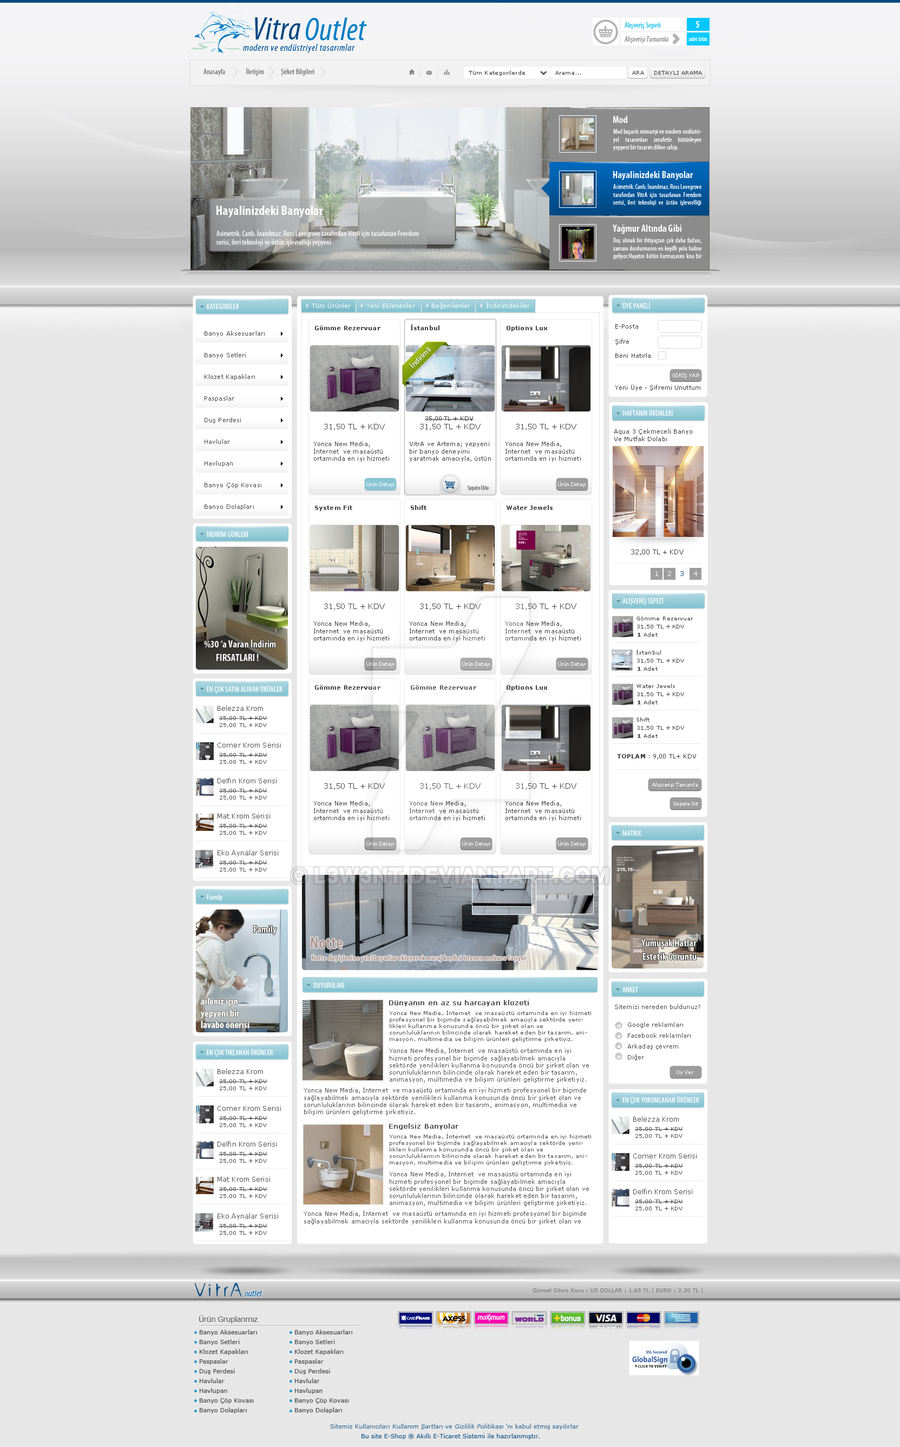 vitra outlet online shopping by l3w3nt on deviantart. Black Bedroom Furniture Sets. Home Design Ideas